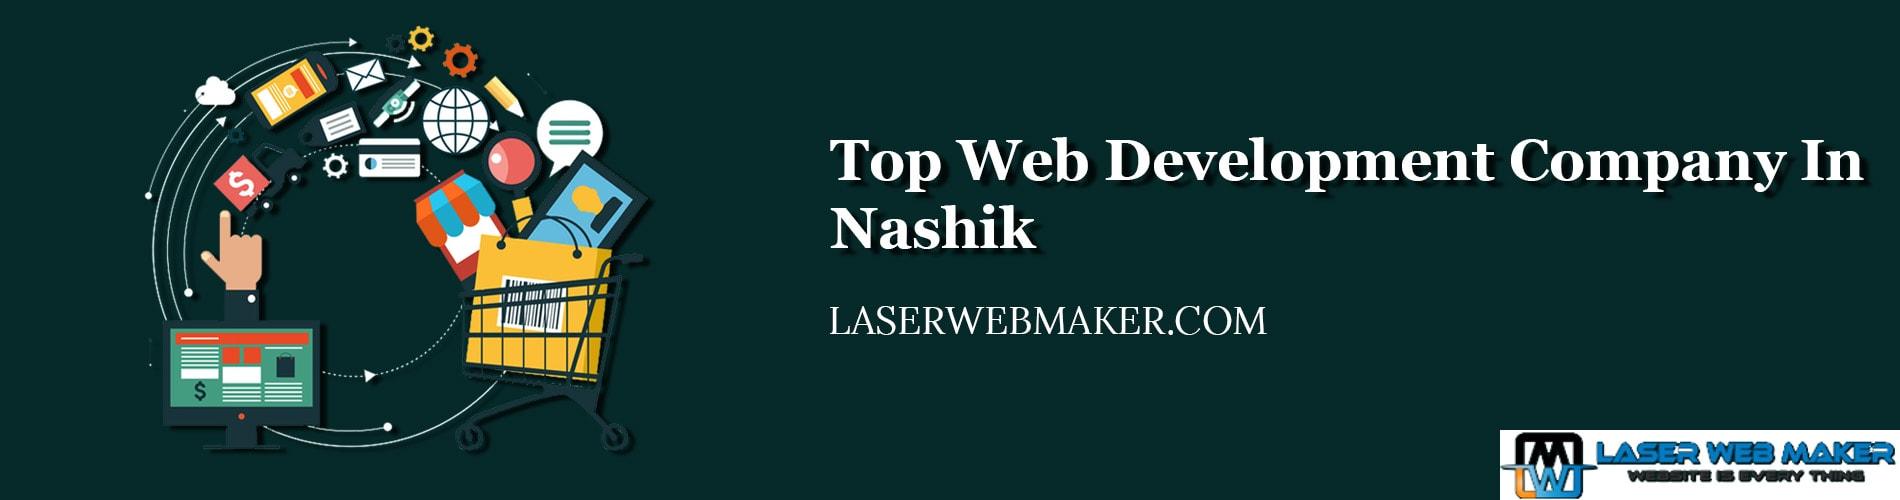 Top Web Development Company In Nashik